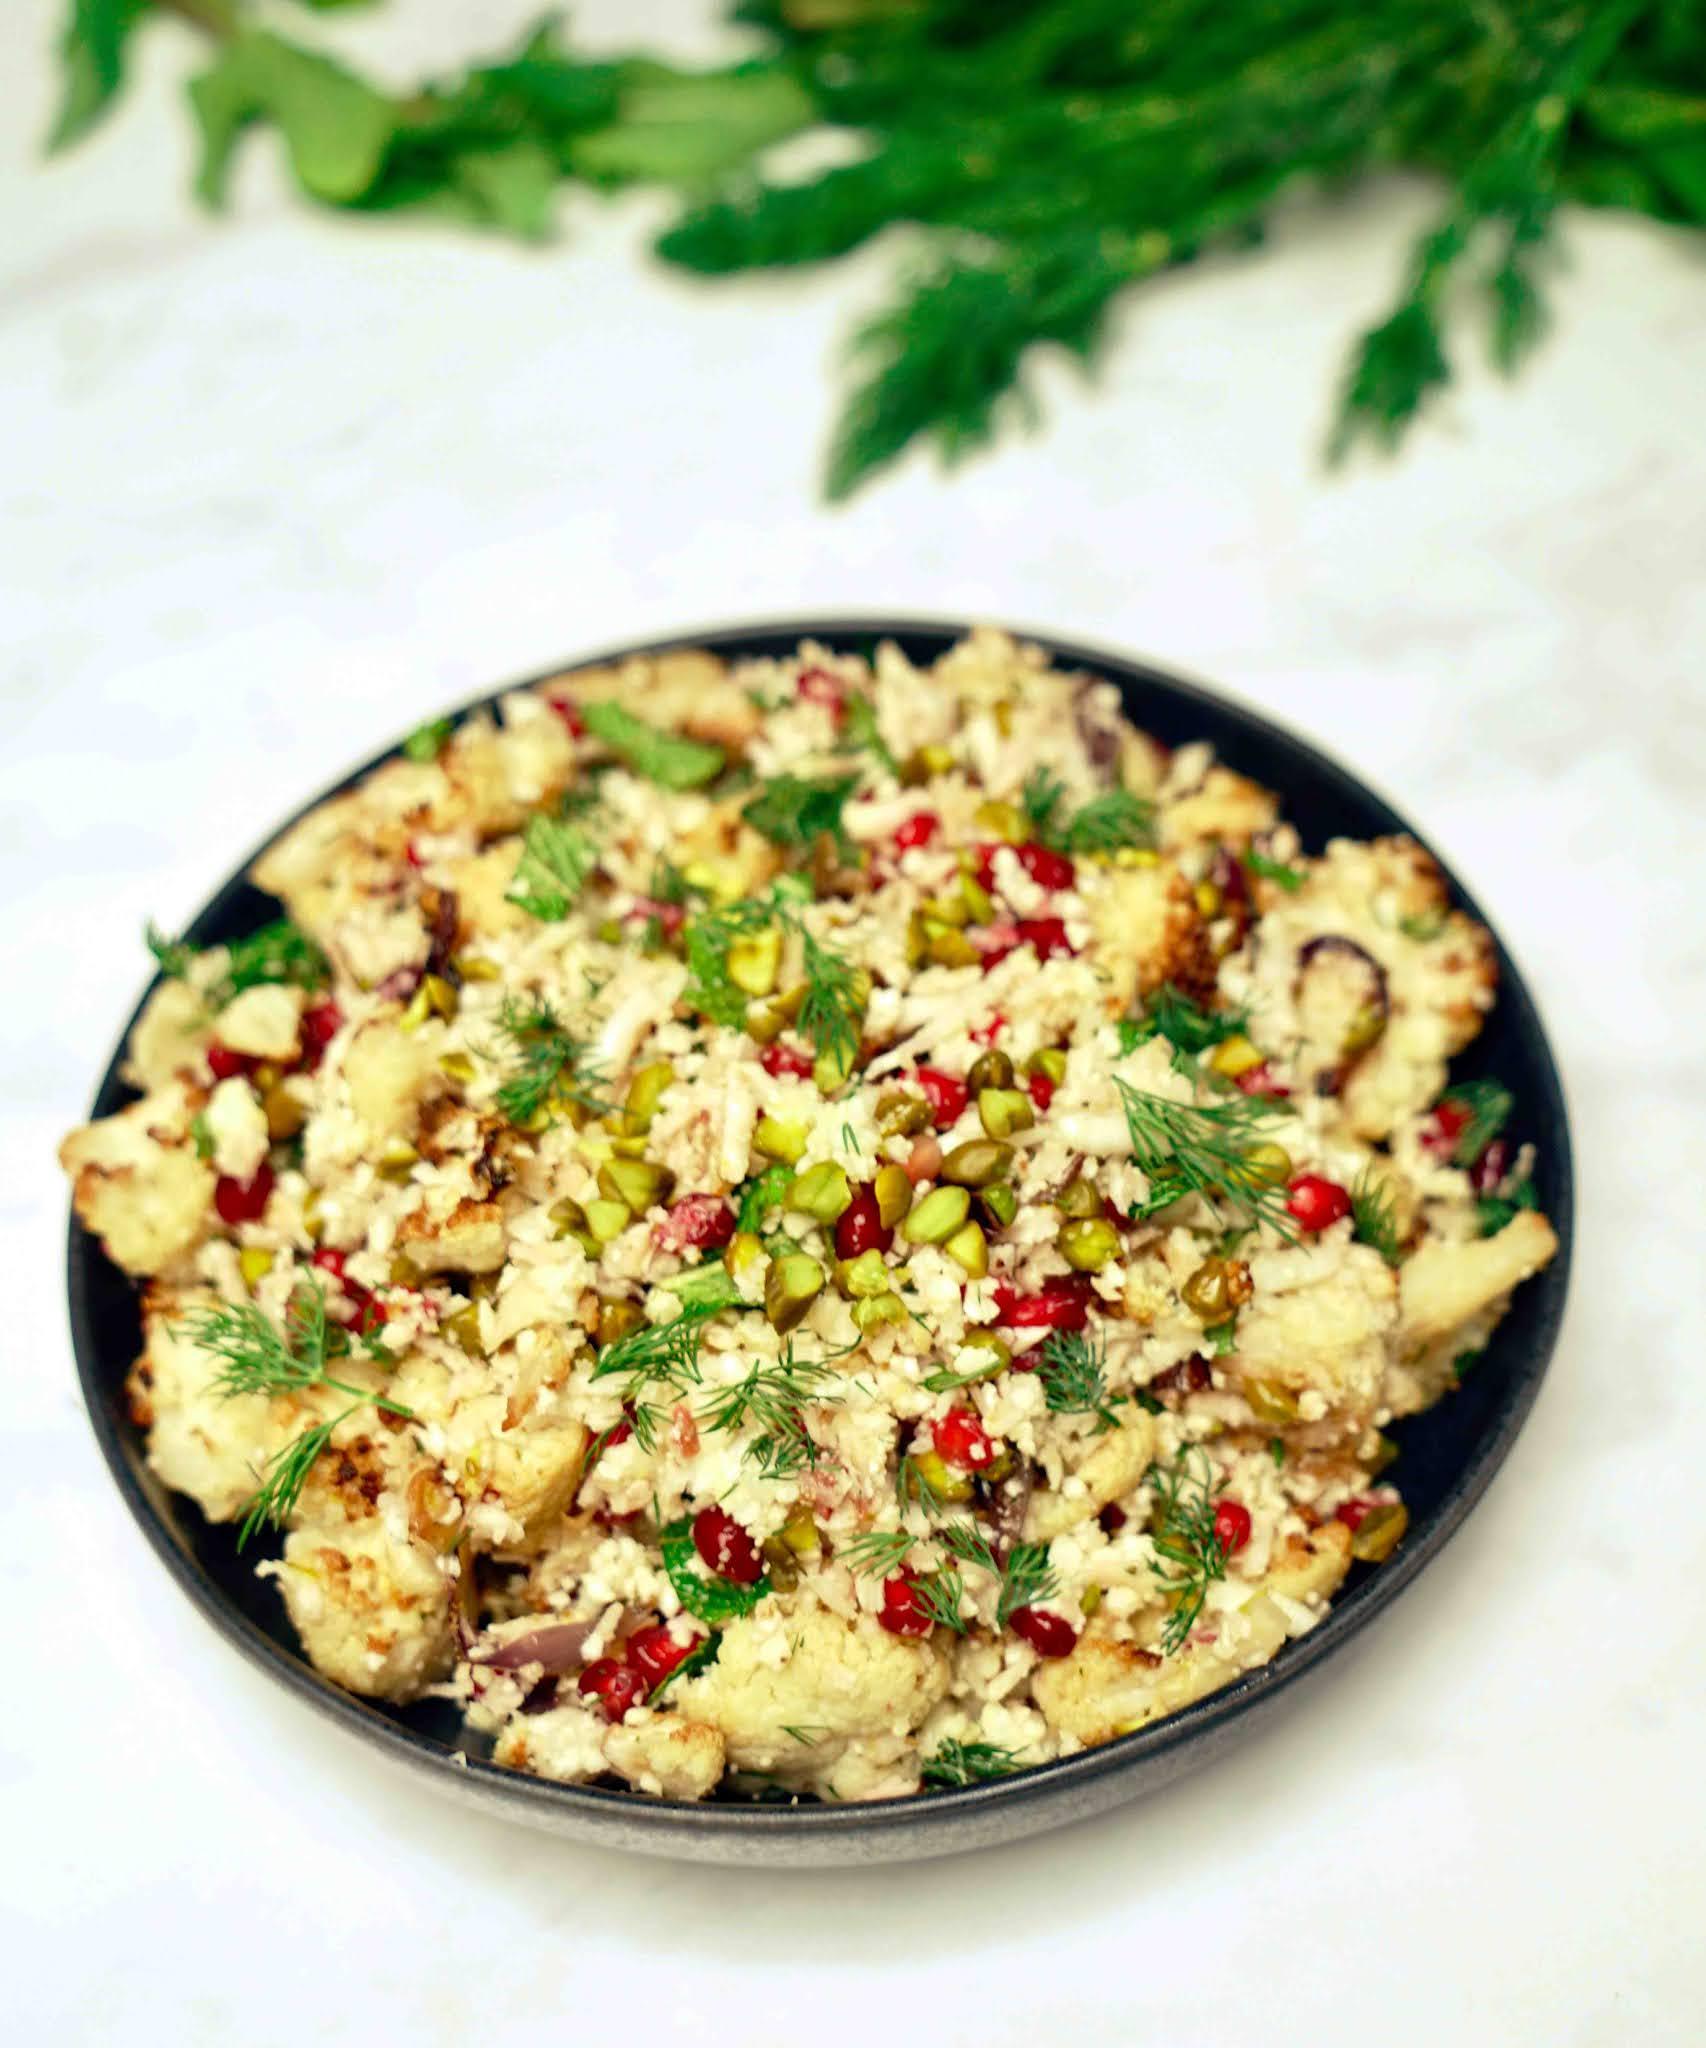 salade, chou-fleur , ottolenghi